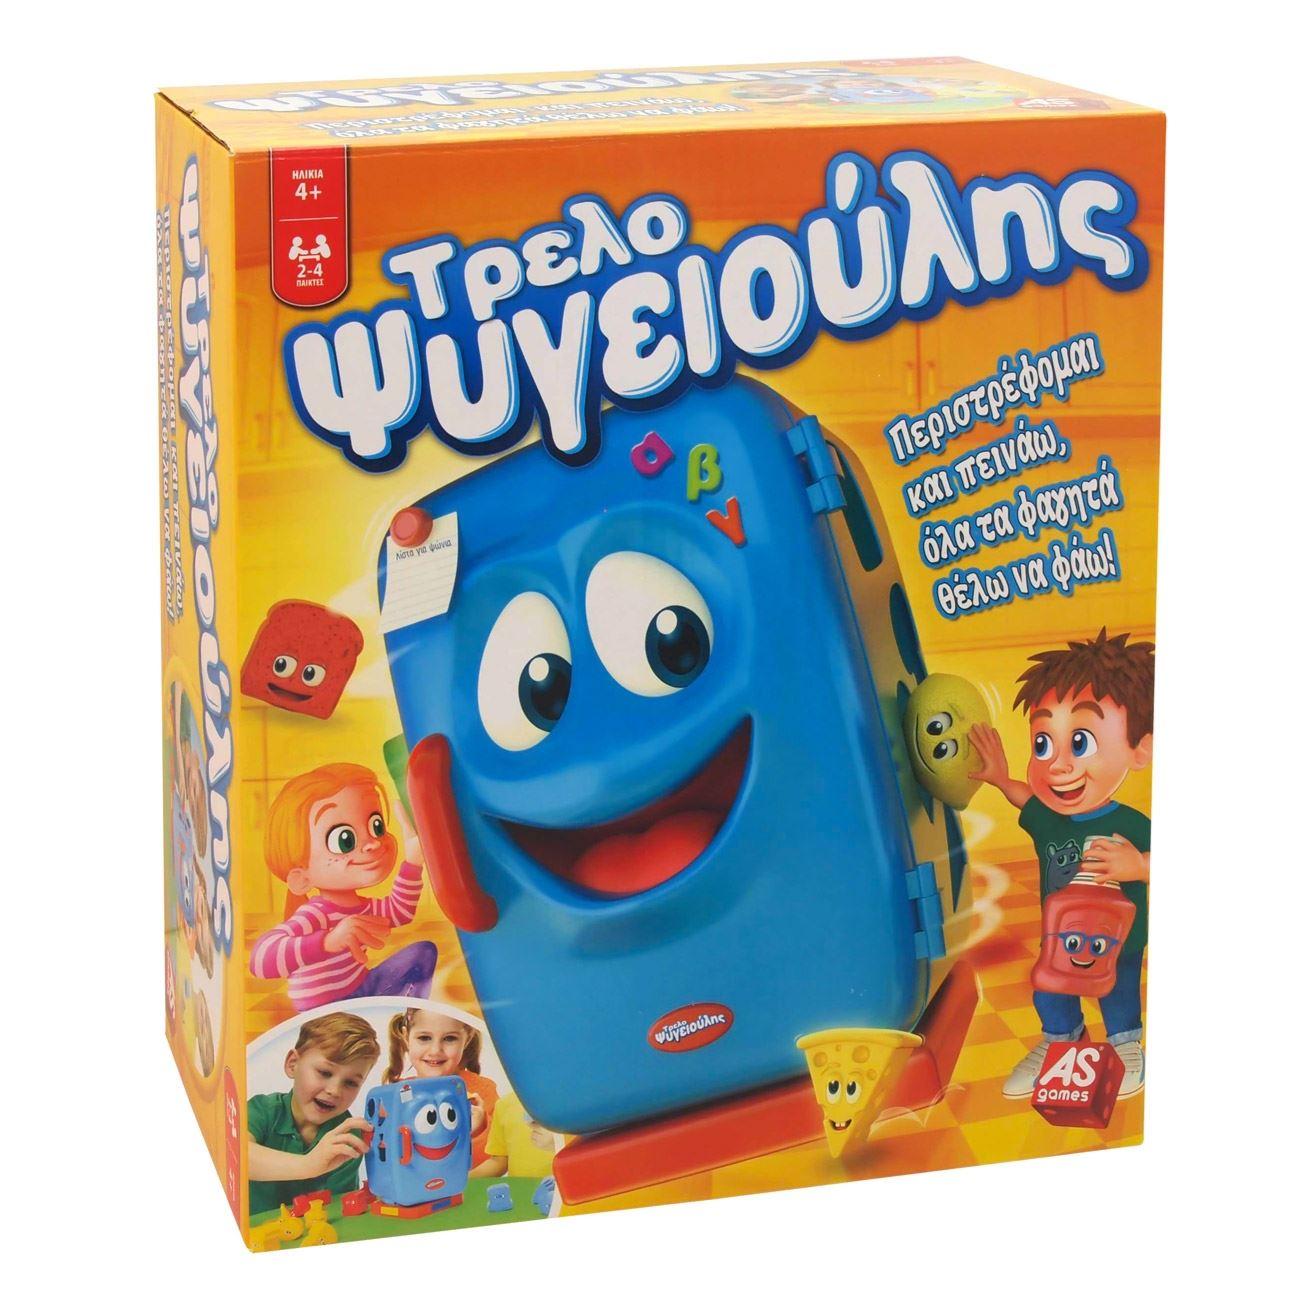 60992b7586b παιχνιδια για παιδια 2 ετων Jumbo   Επιτραπέζιο ΤρελοΨυγειούλης - AS <  Επιτραπέζια Ψυχαγωγίας Παιδικά .